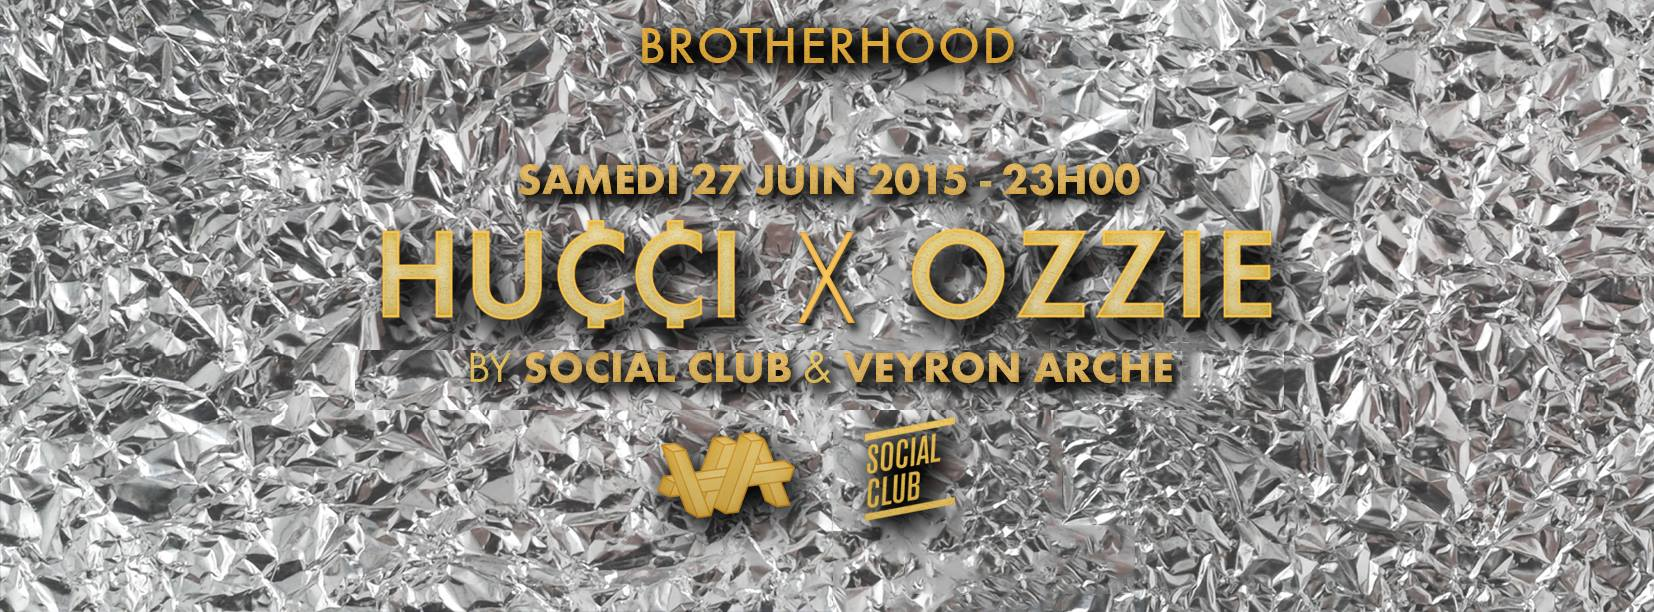 Hucci & Ozzie Social Club